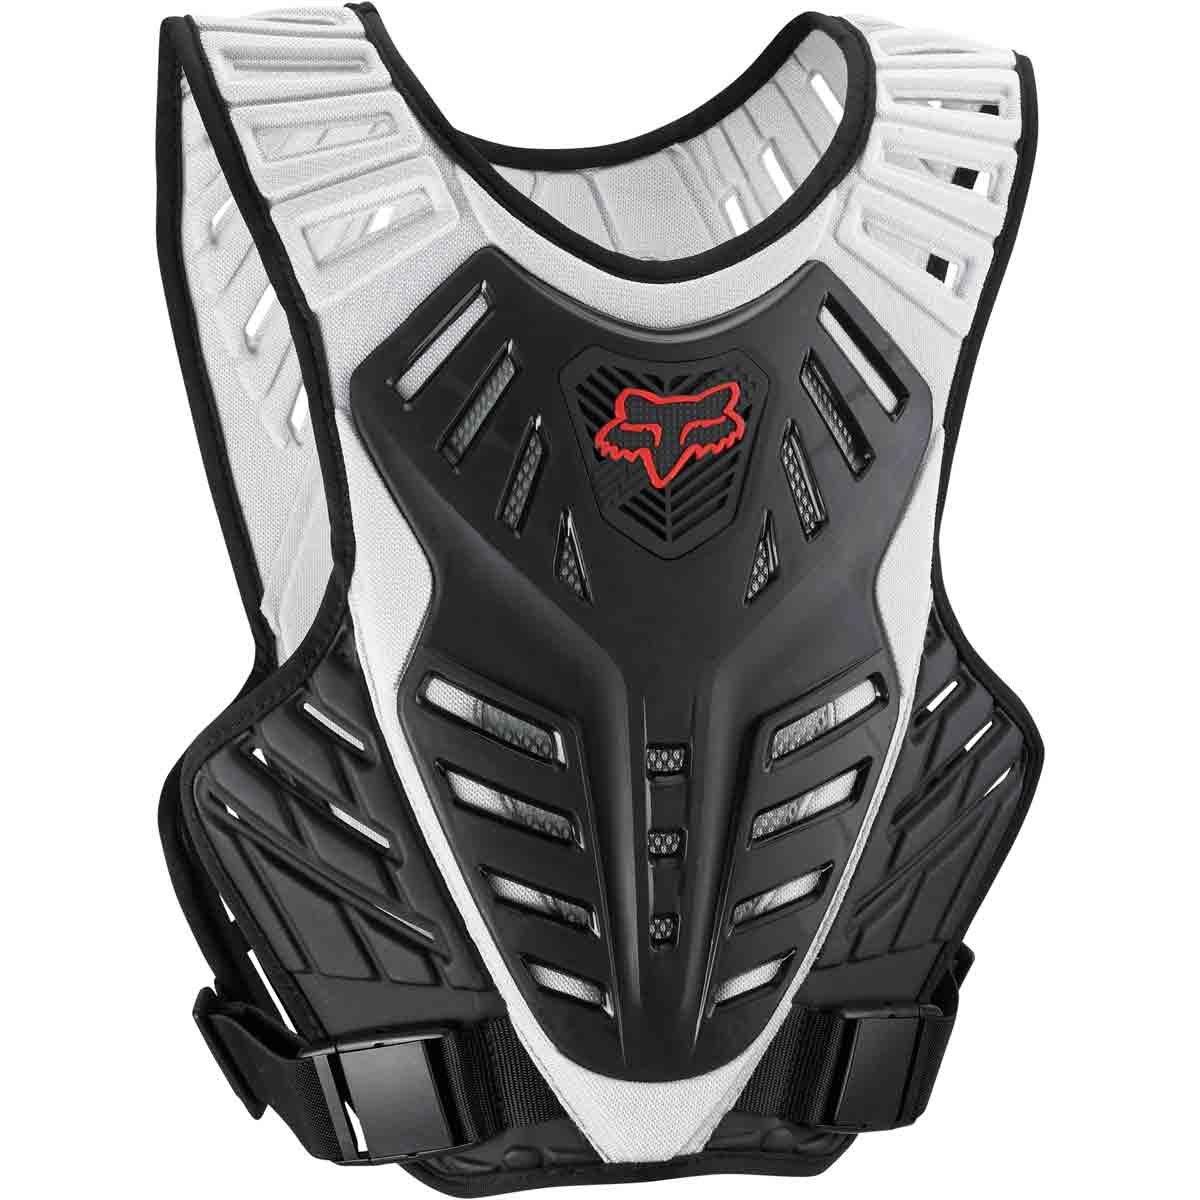 Fox Racing Titan Race Subframe Men's Roost Deflector Motocross Motorcycle Body Armor - Black/Silver/Medium/Large